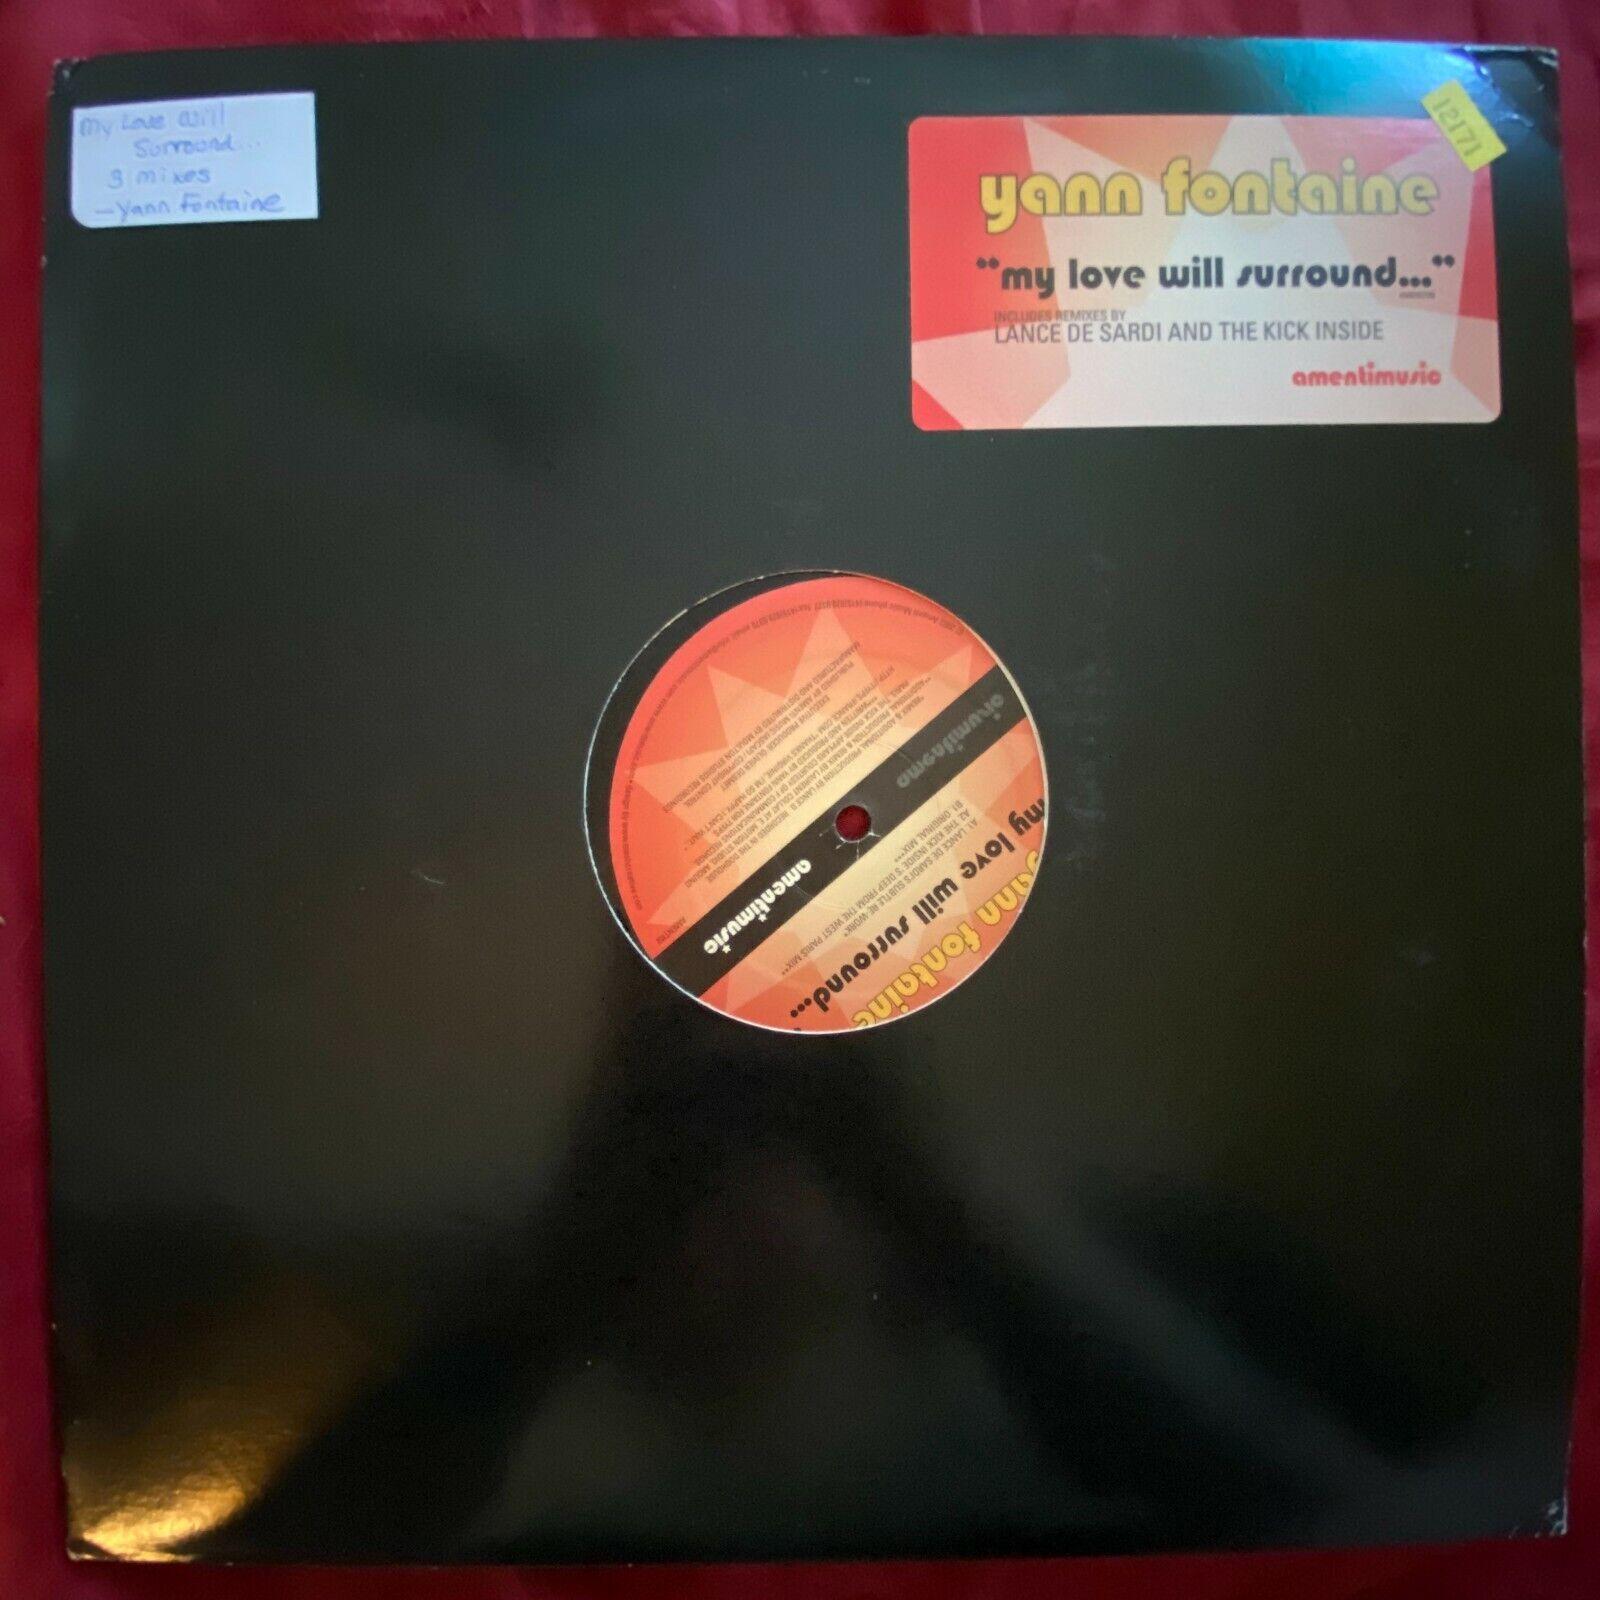 Yann Fontaine My Love Will Surround 2002 Amenti Music 12 Single Electro House - $8.76